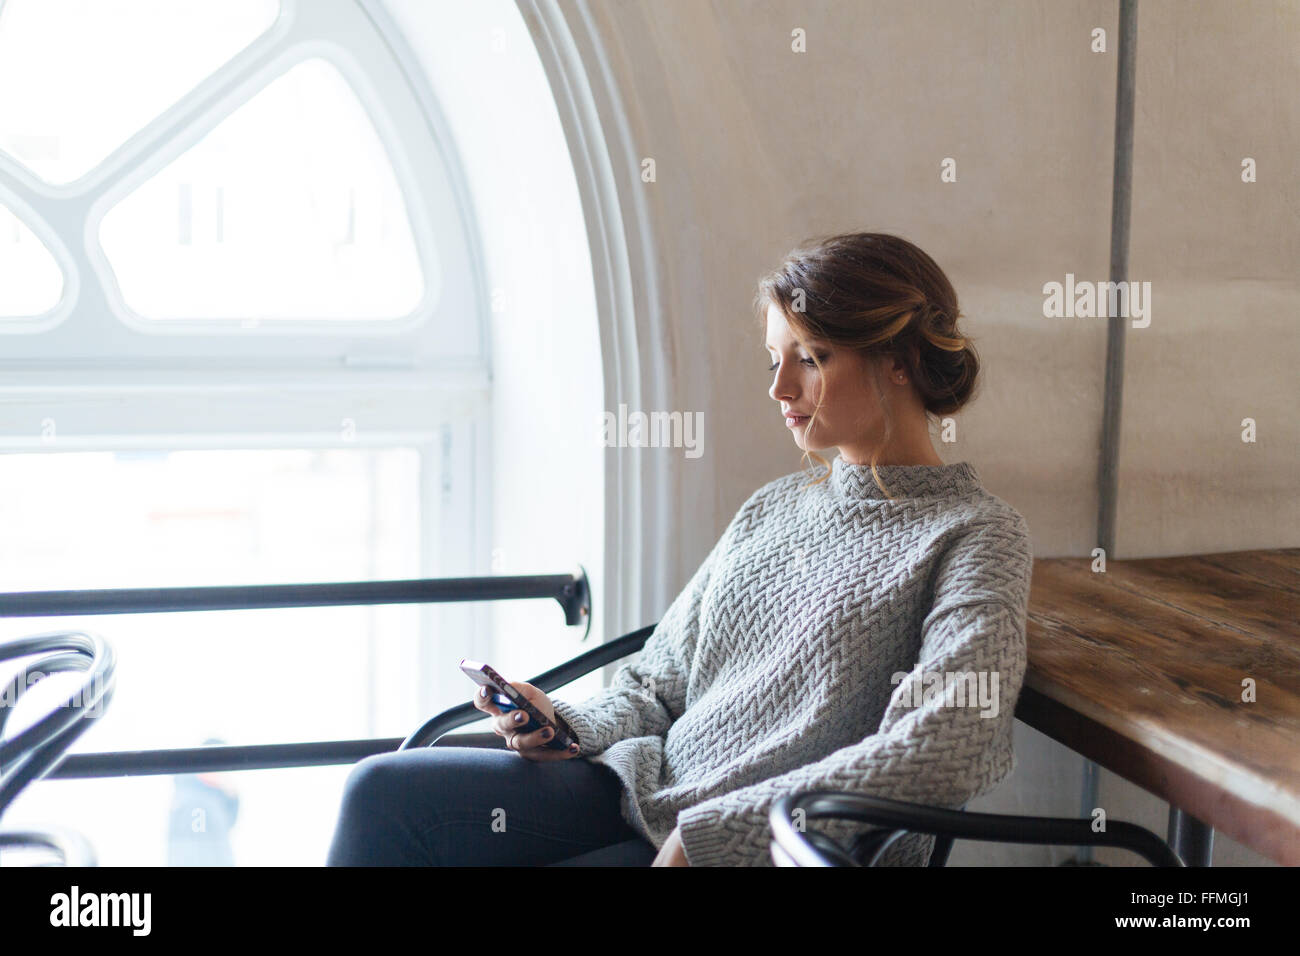 Junge schöne Frau mit Smartphone im café Stockbild